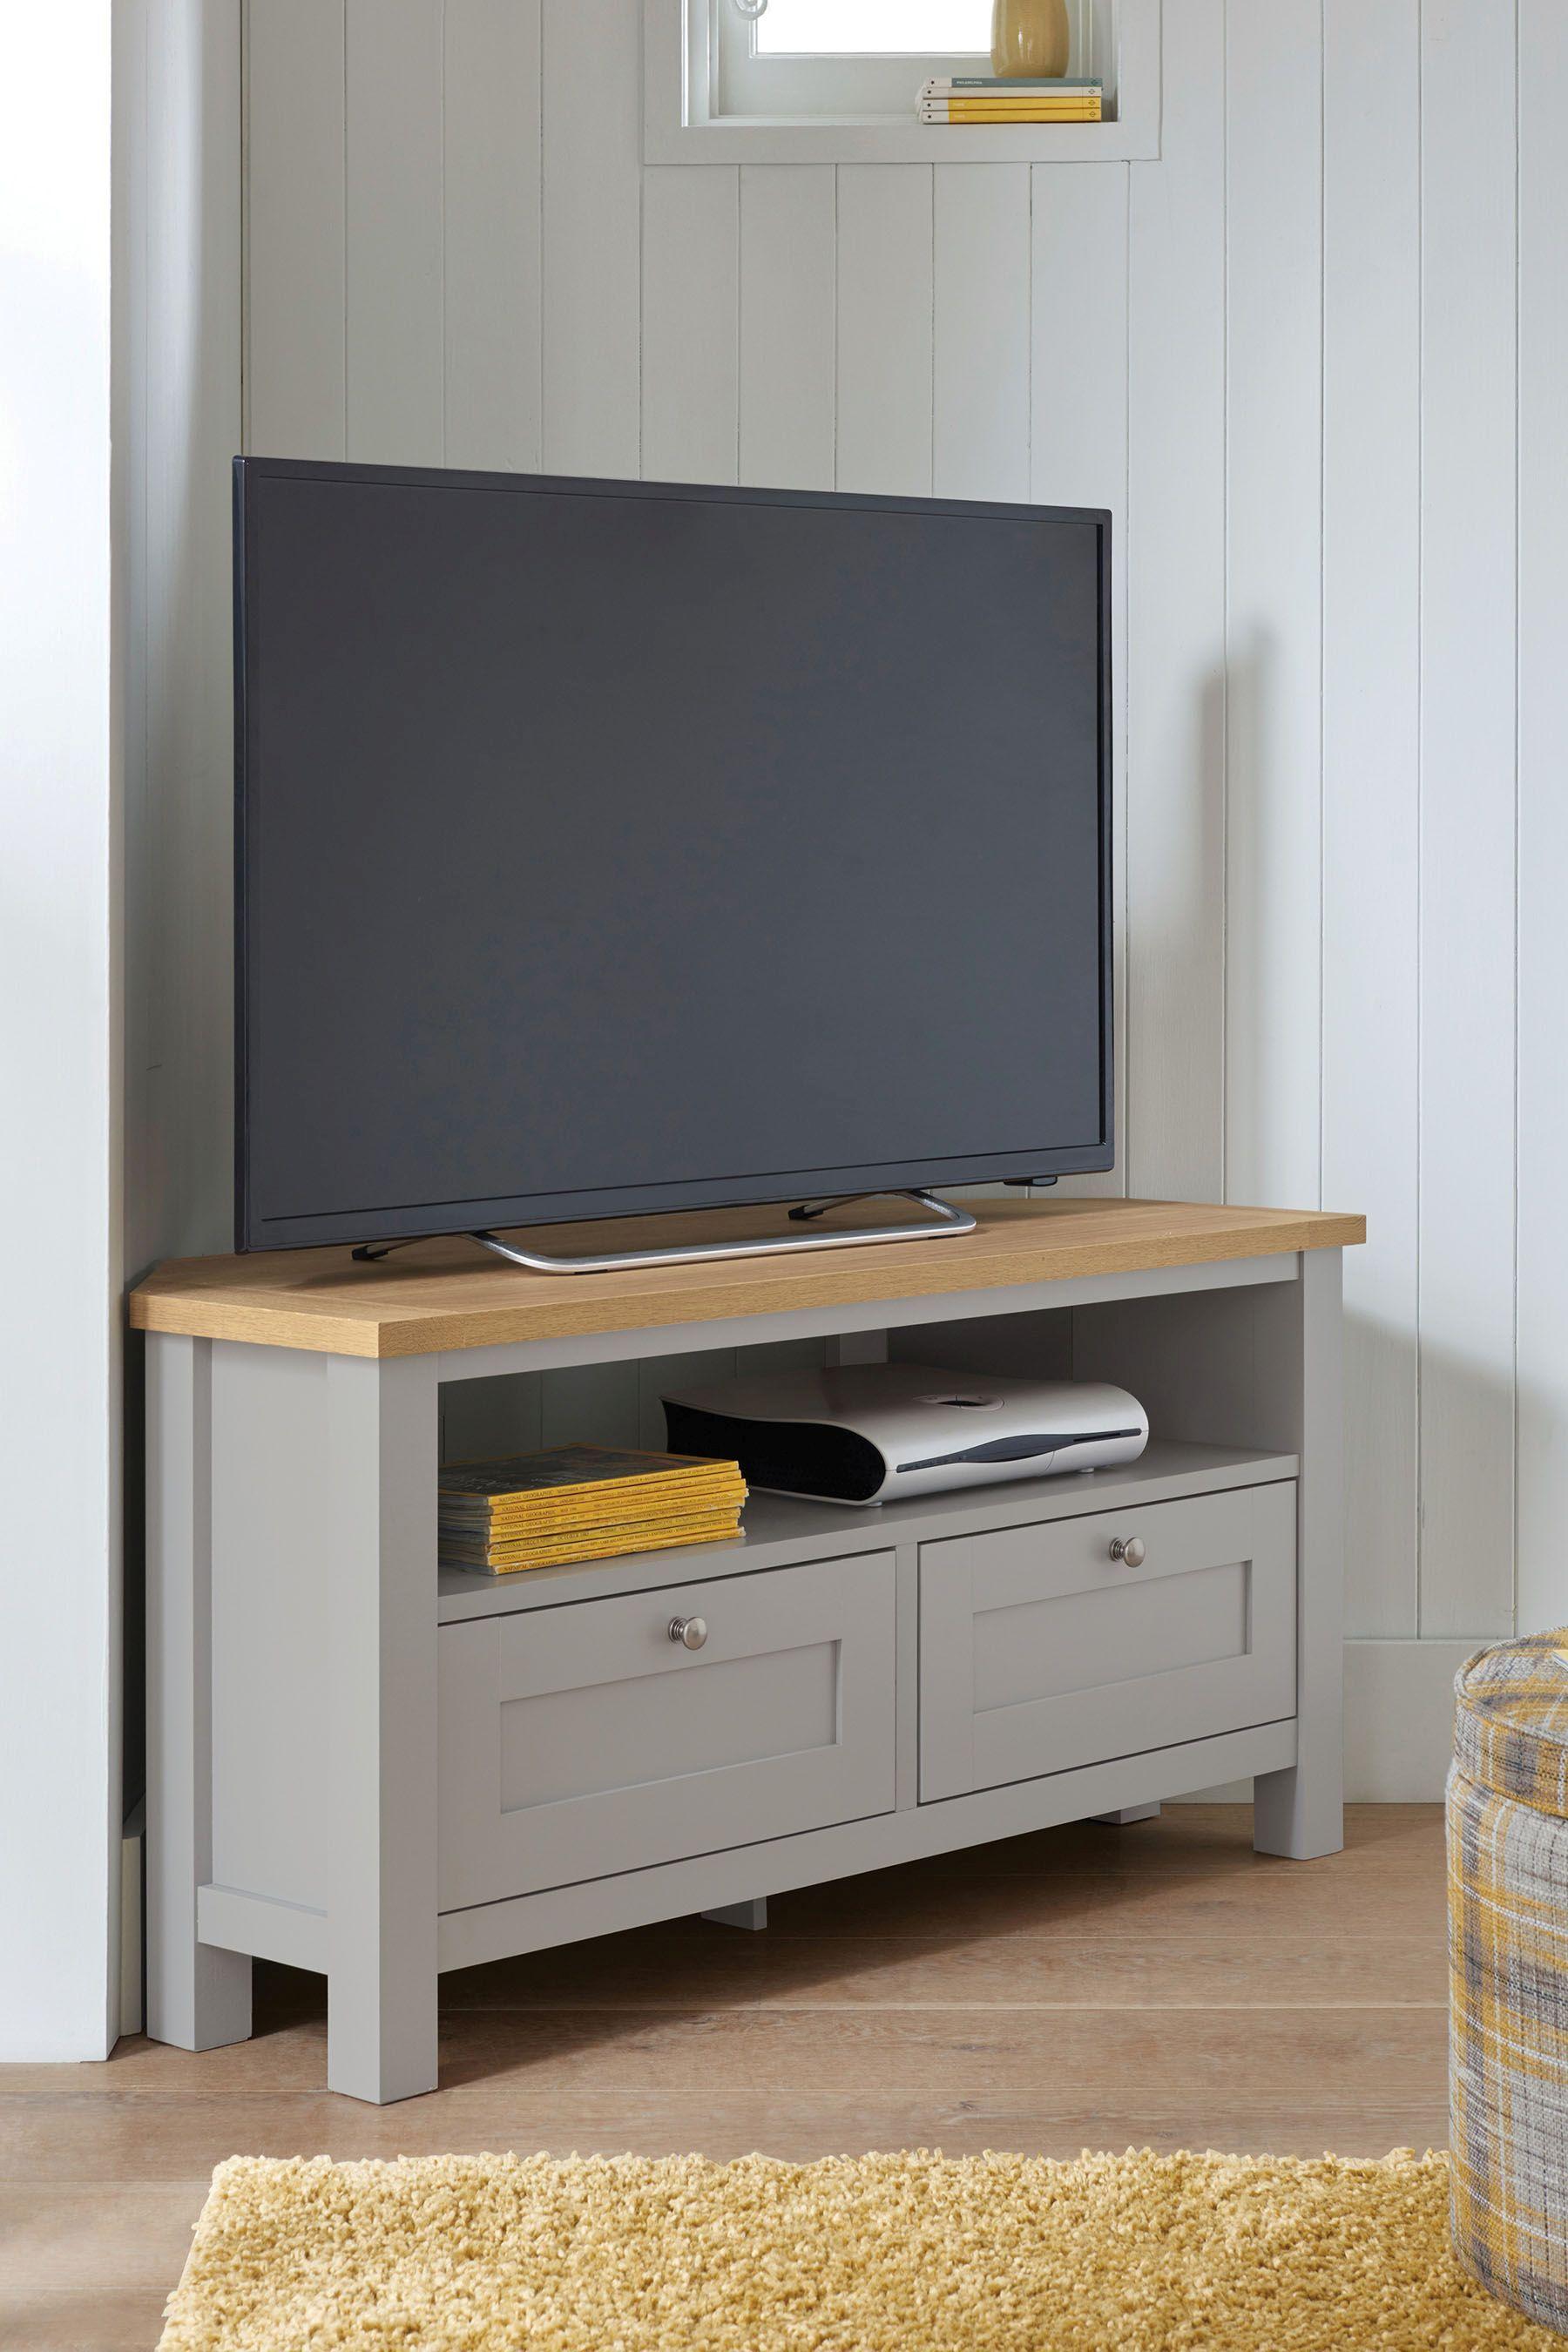 Next Malvern Corner Tv Stand Grey Living Room Tv Stand Corner Tv Stands Corner Tv